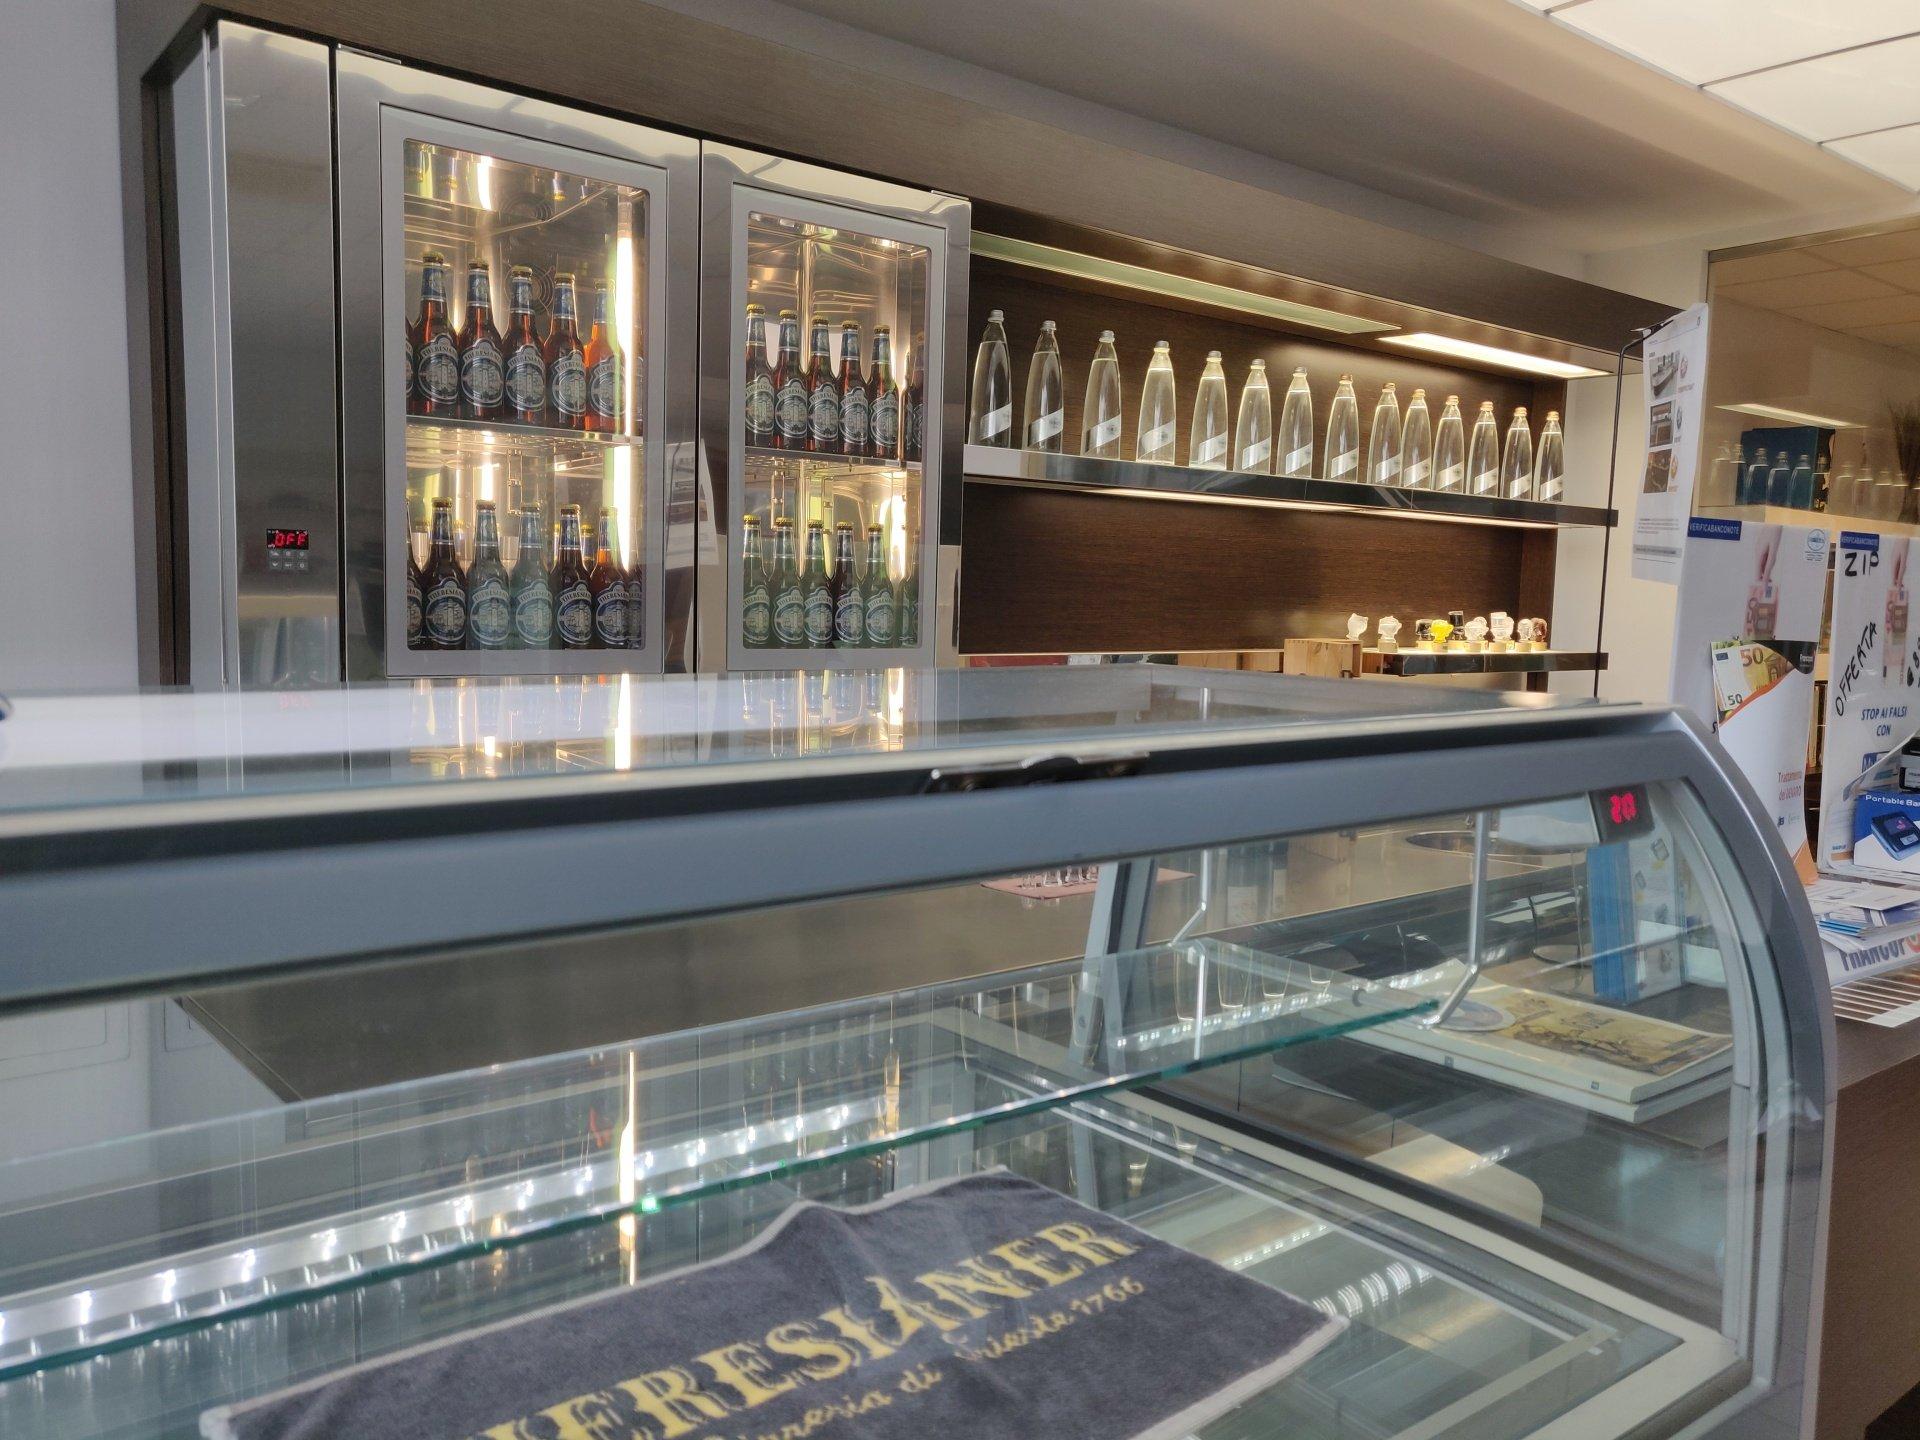 banconi refrigerati arezzo duearreda arredamento negozi